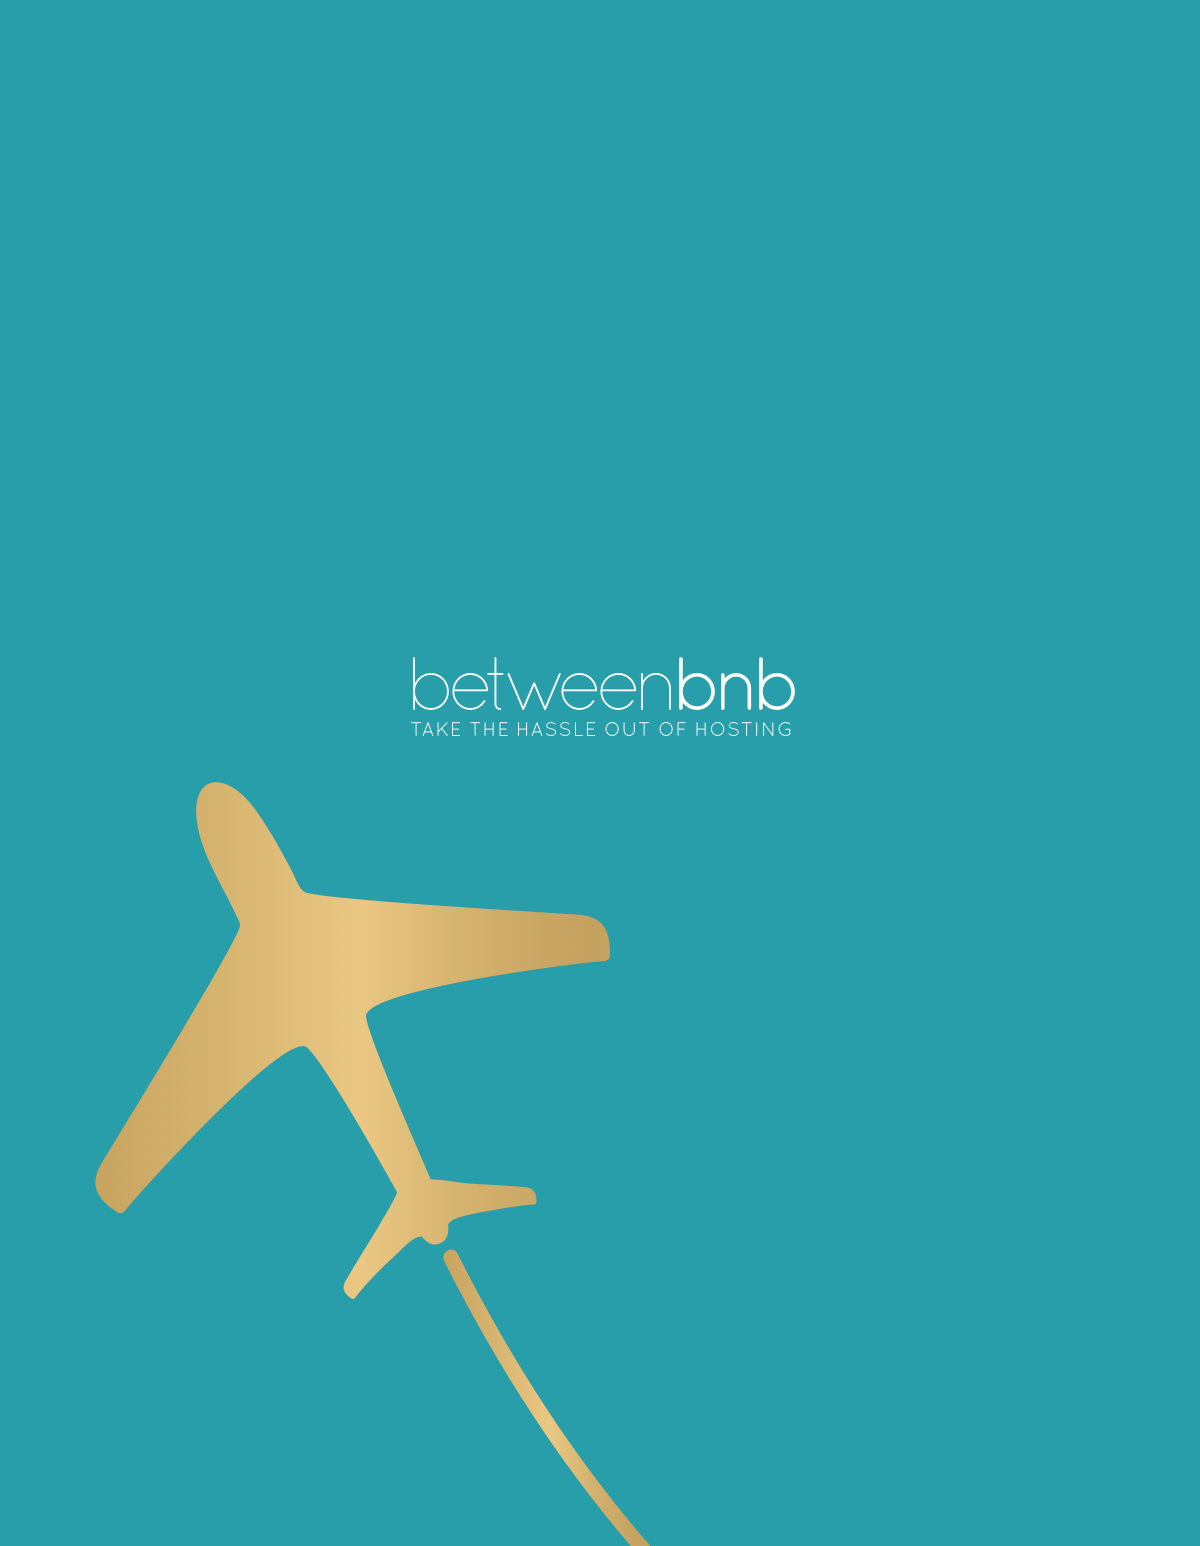 betweenbnb additional letterhead design